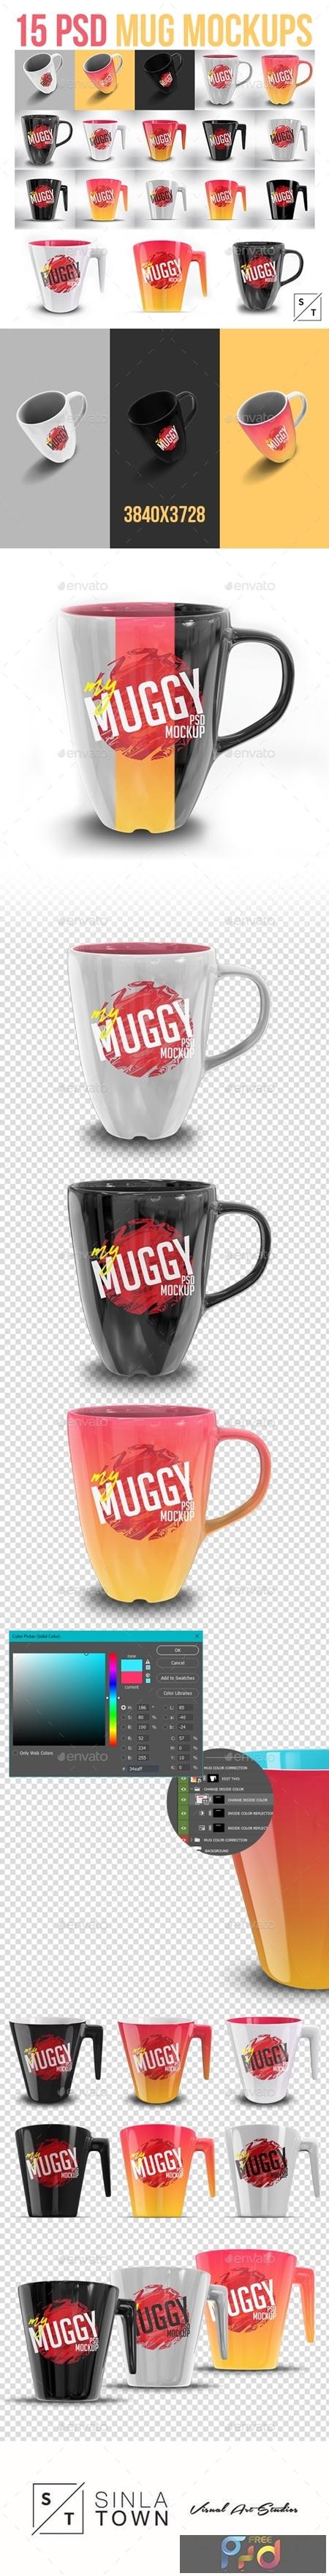 Photorealistic 15 PSD Mockup Mug Set 22658898 1